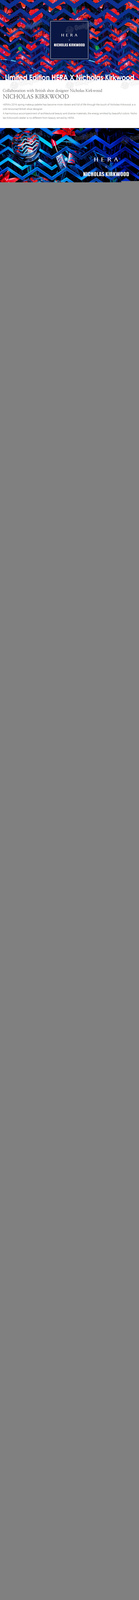 HERA 2016 S/S HERA Limited Edition! HERA X Nicholas Kirkwood / UV Mist Cushion /